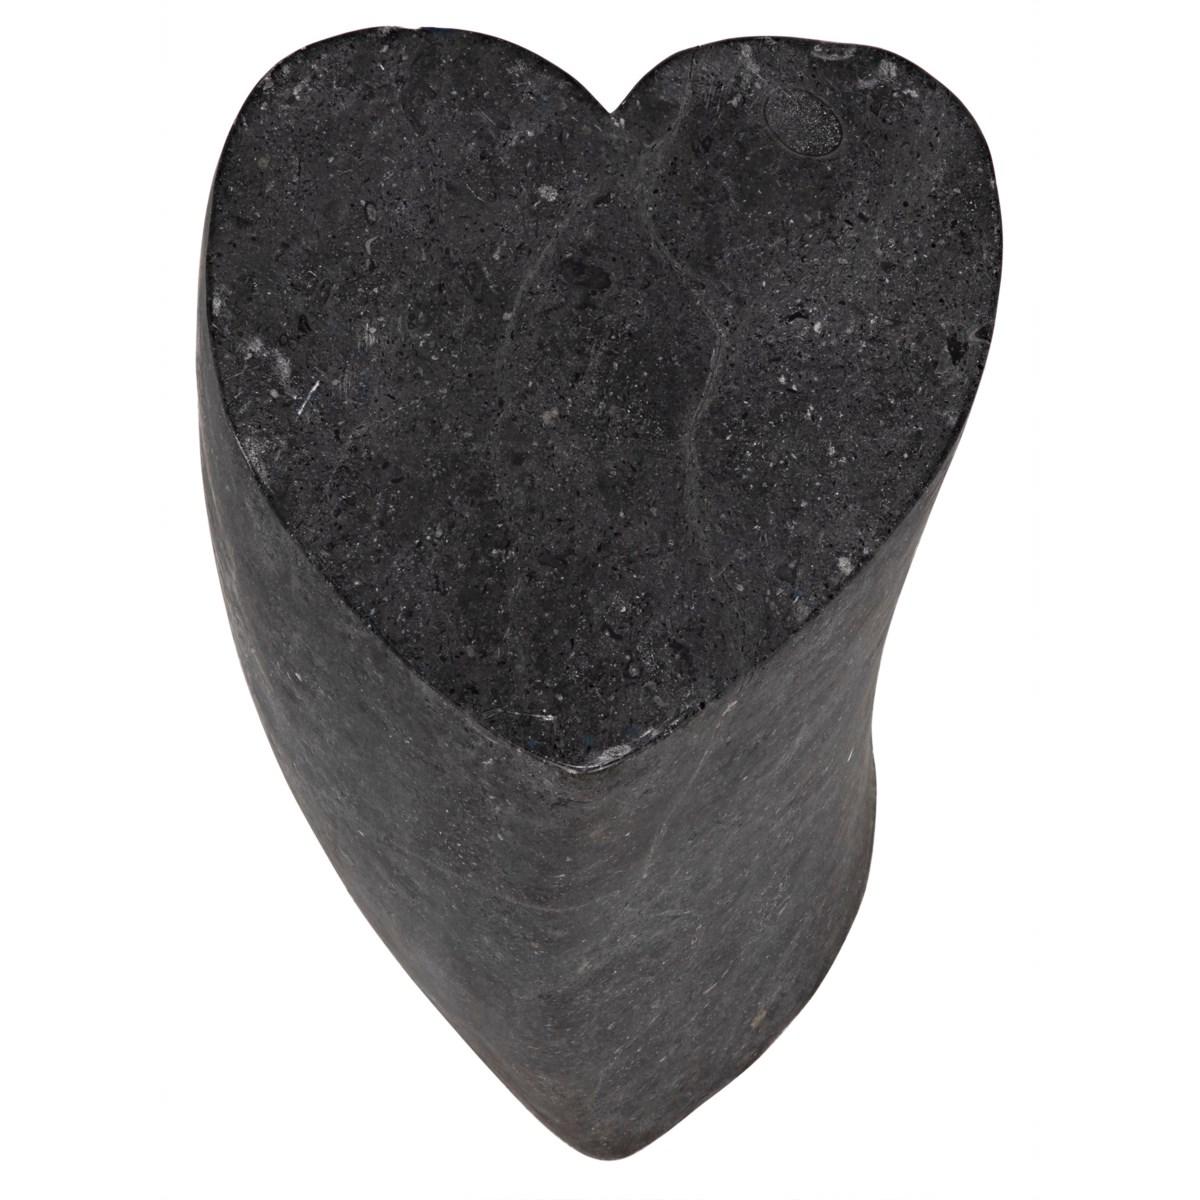 Heart, Black Marble